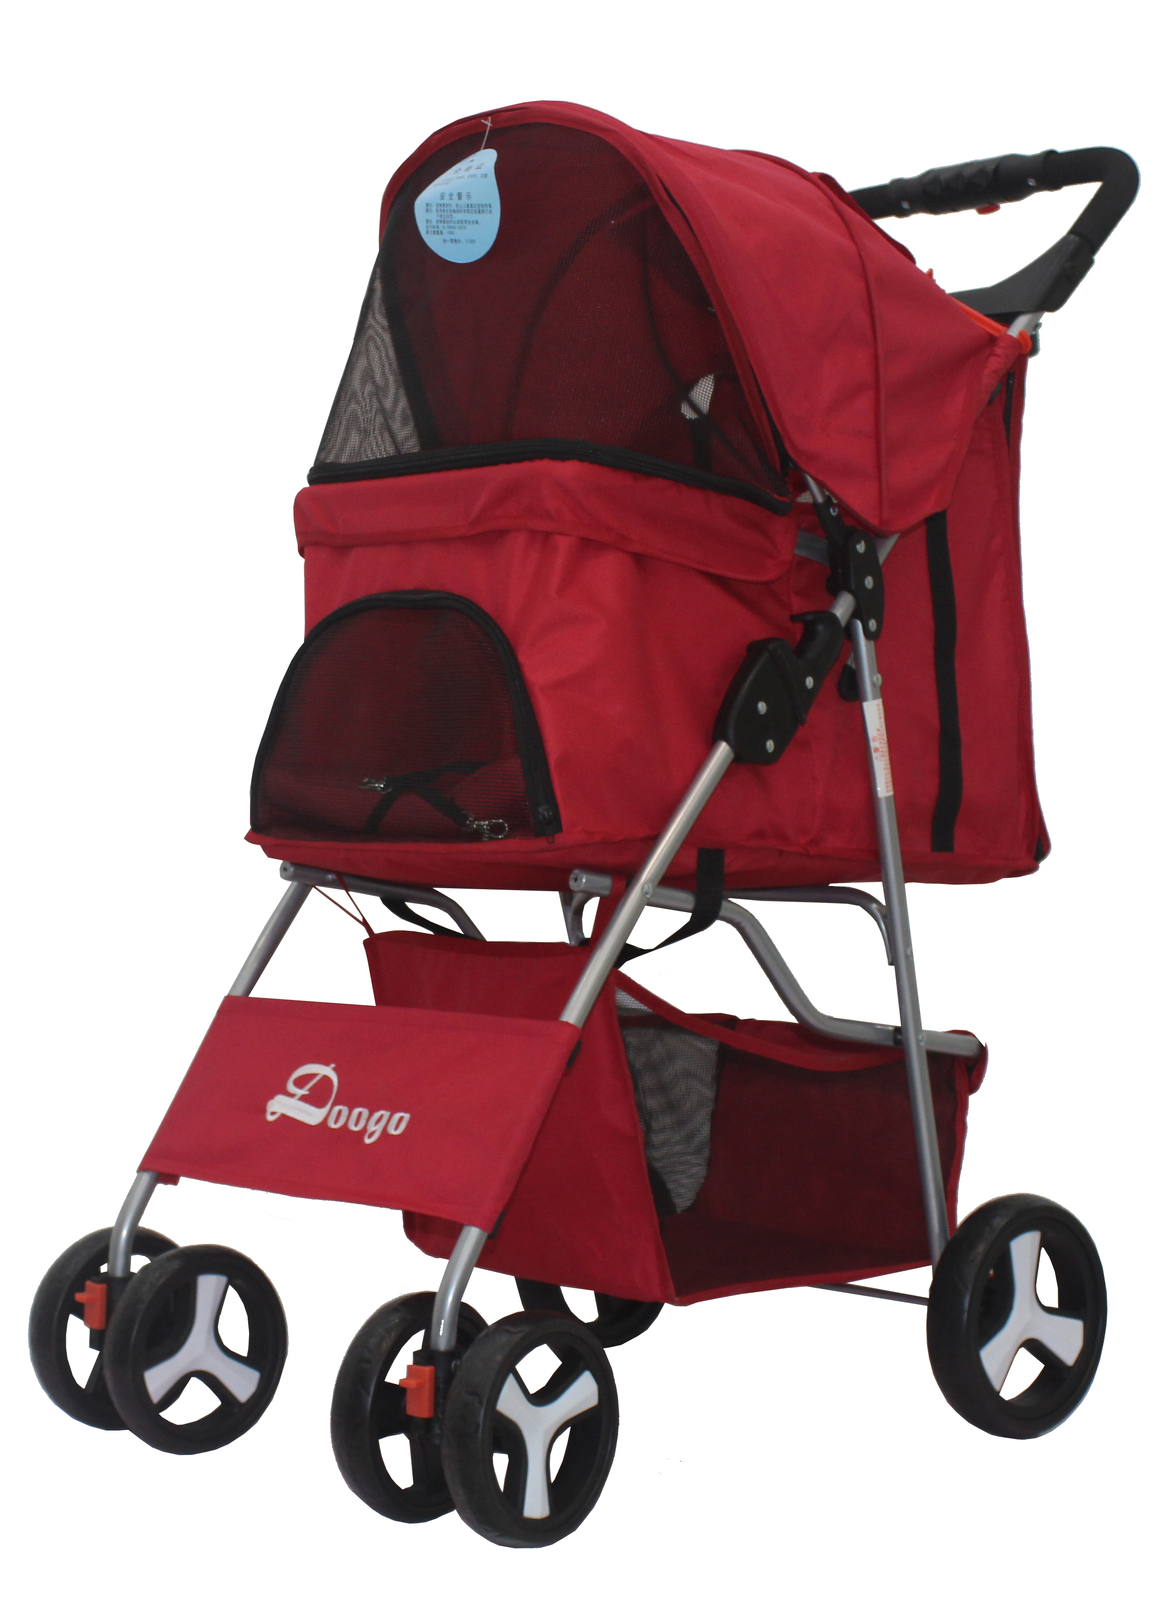 Easy Walk Pet Stroller - Red image